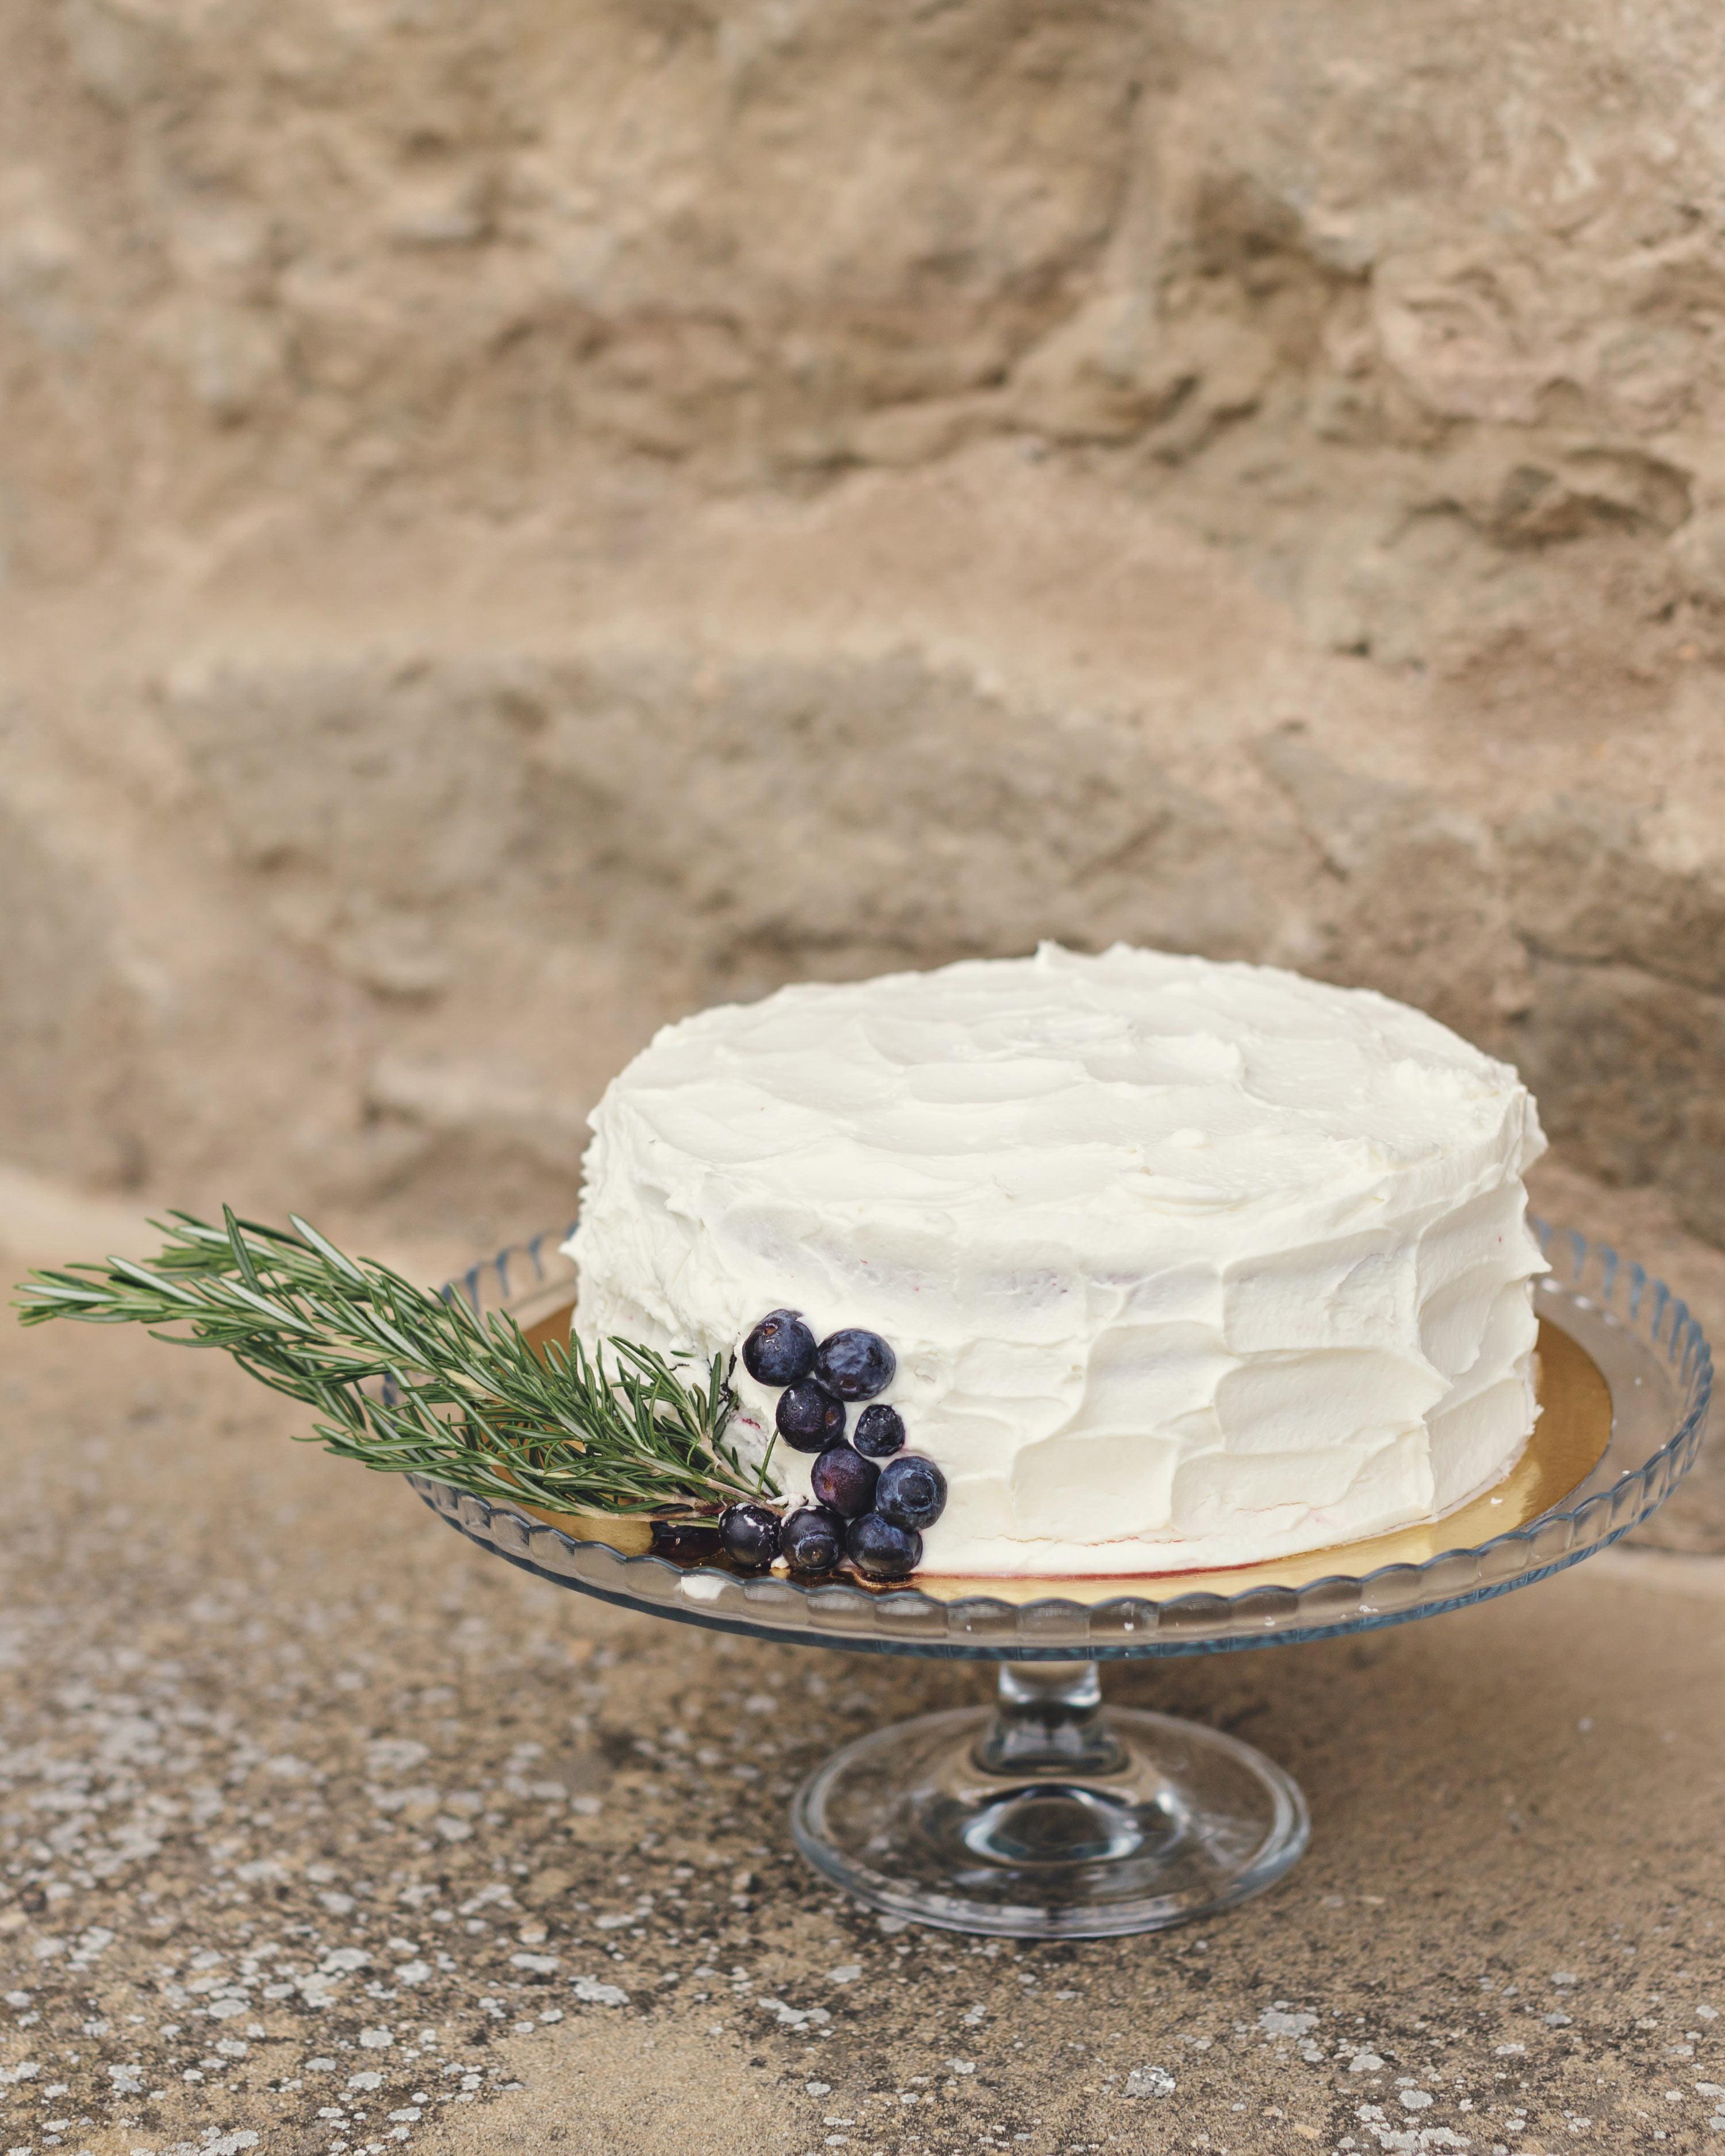 anna-ania-wedding-cake-078-s112510-0216.jpg